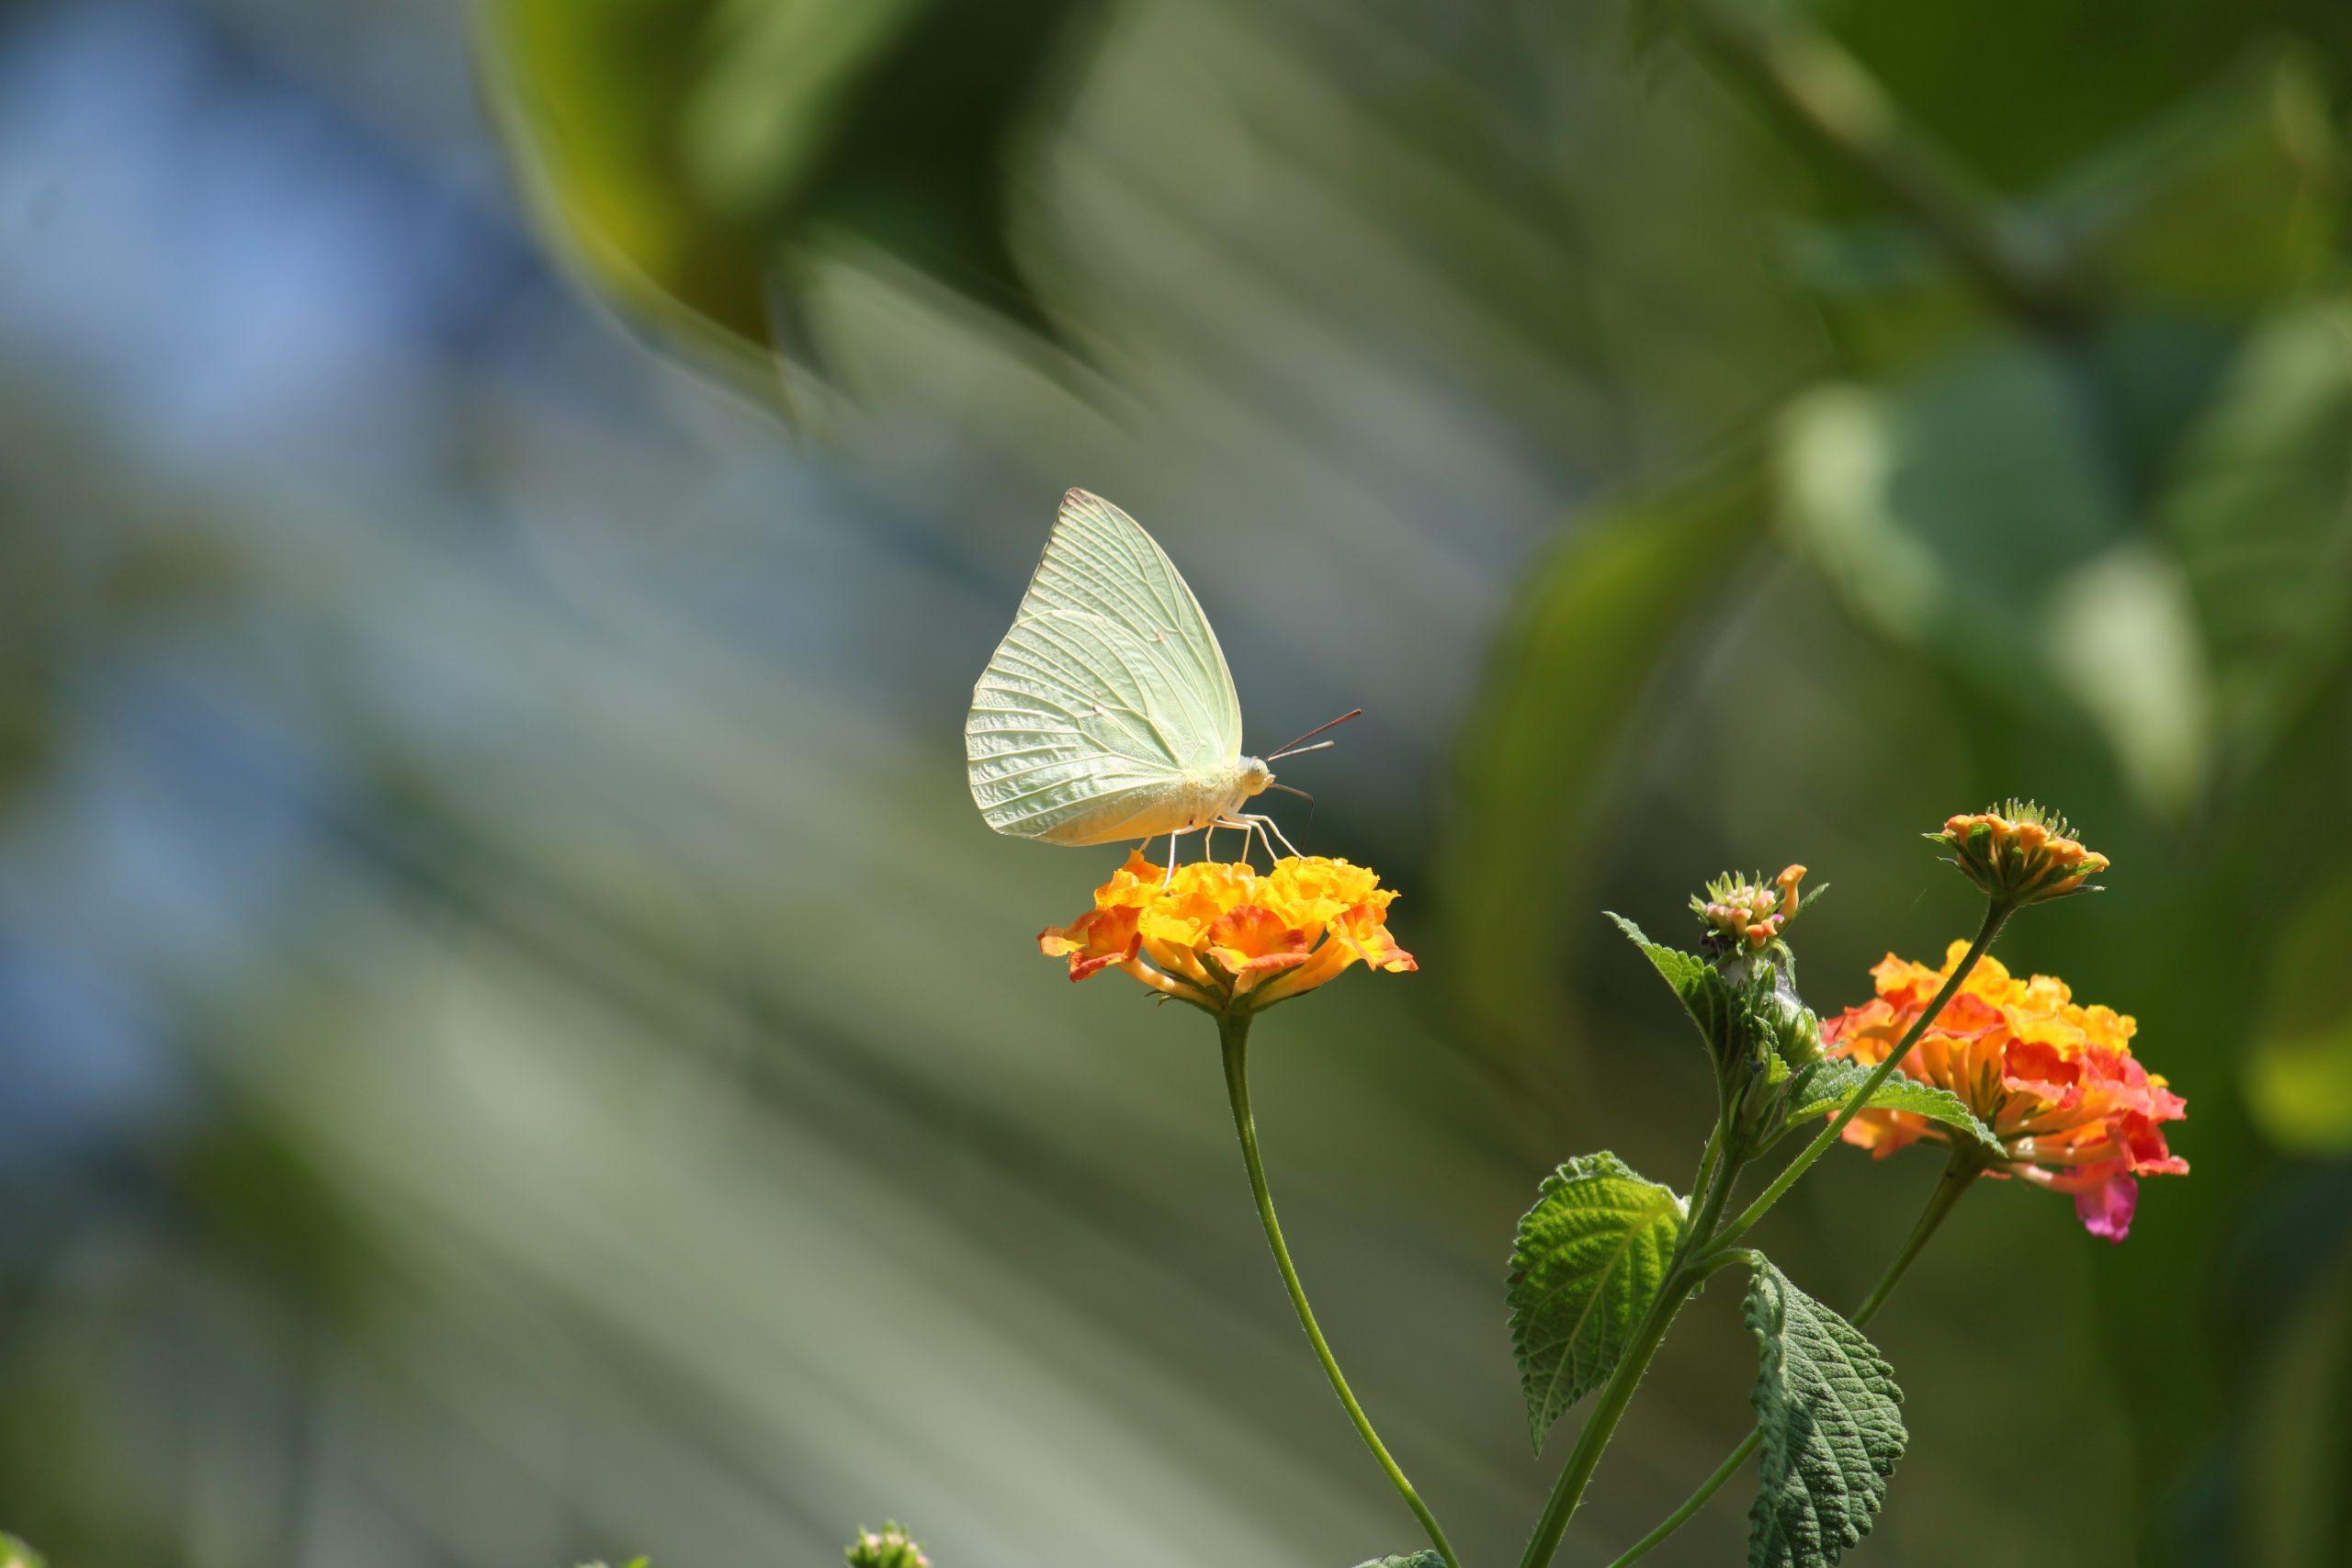 A butterfly on a flower